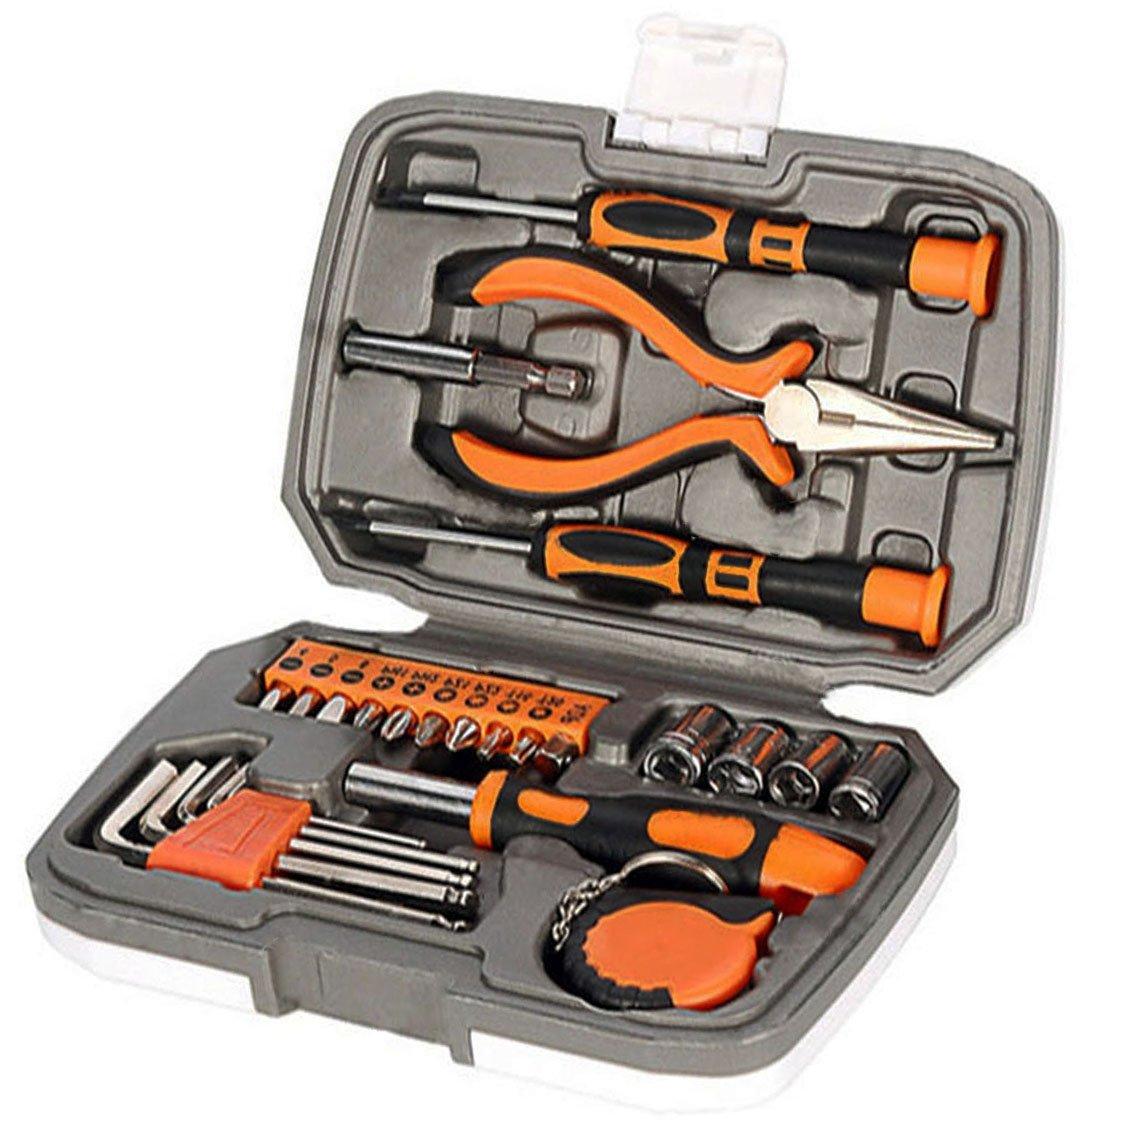 Hand Tool Set, Screwdriver with Toolbox Storage (25 PCS)